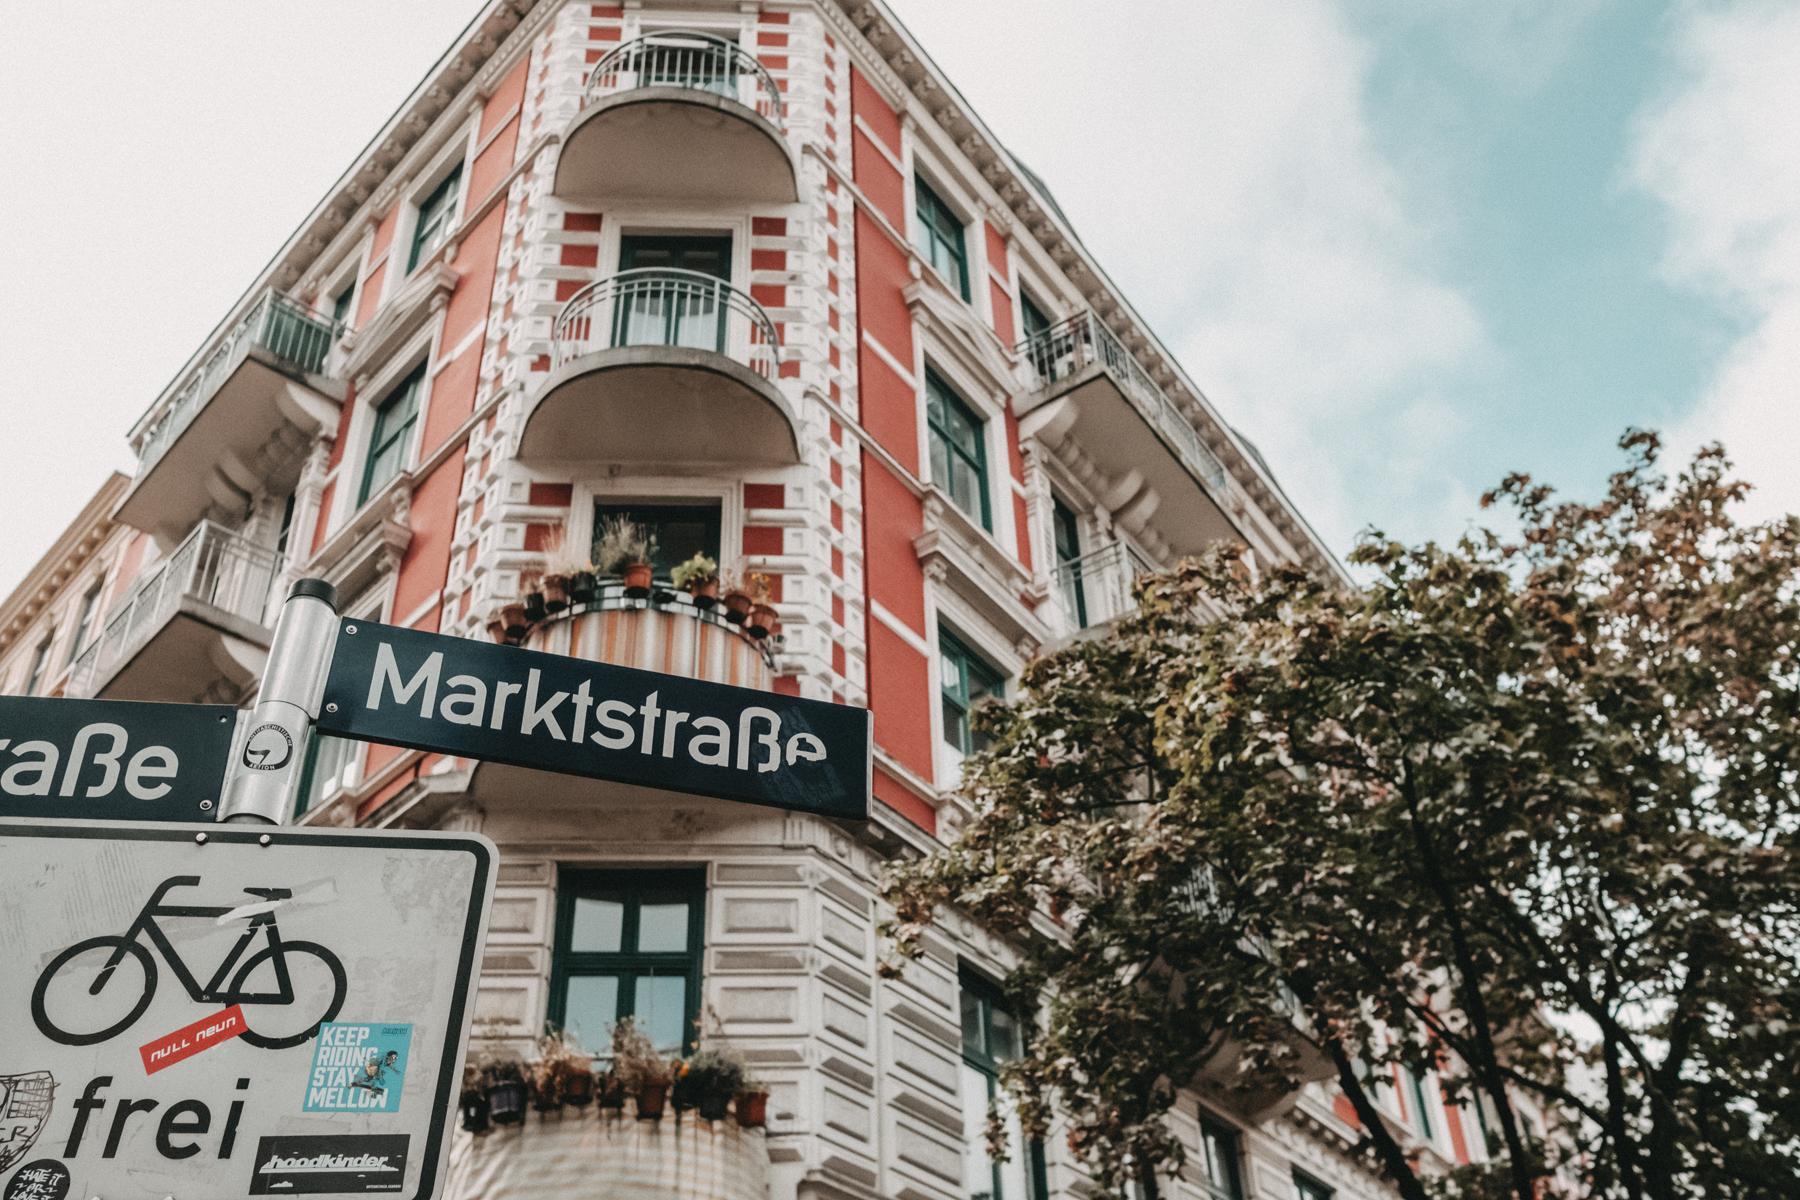 Marktstraße 31